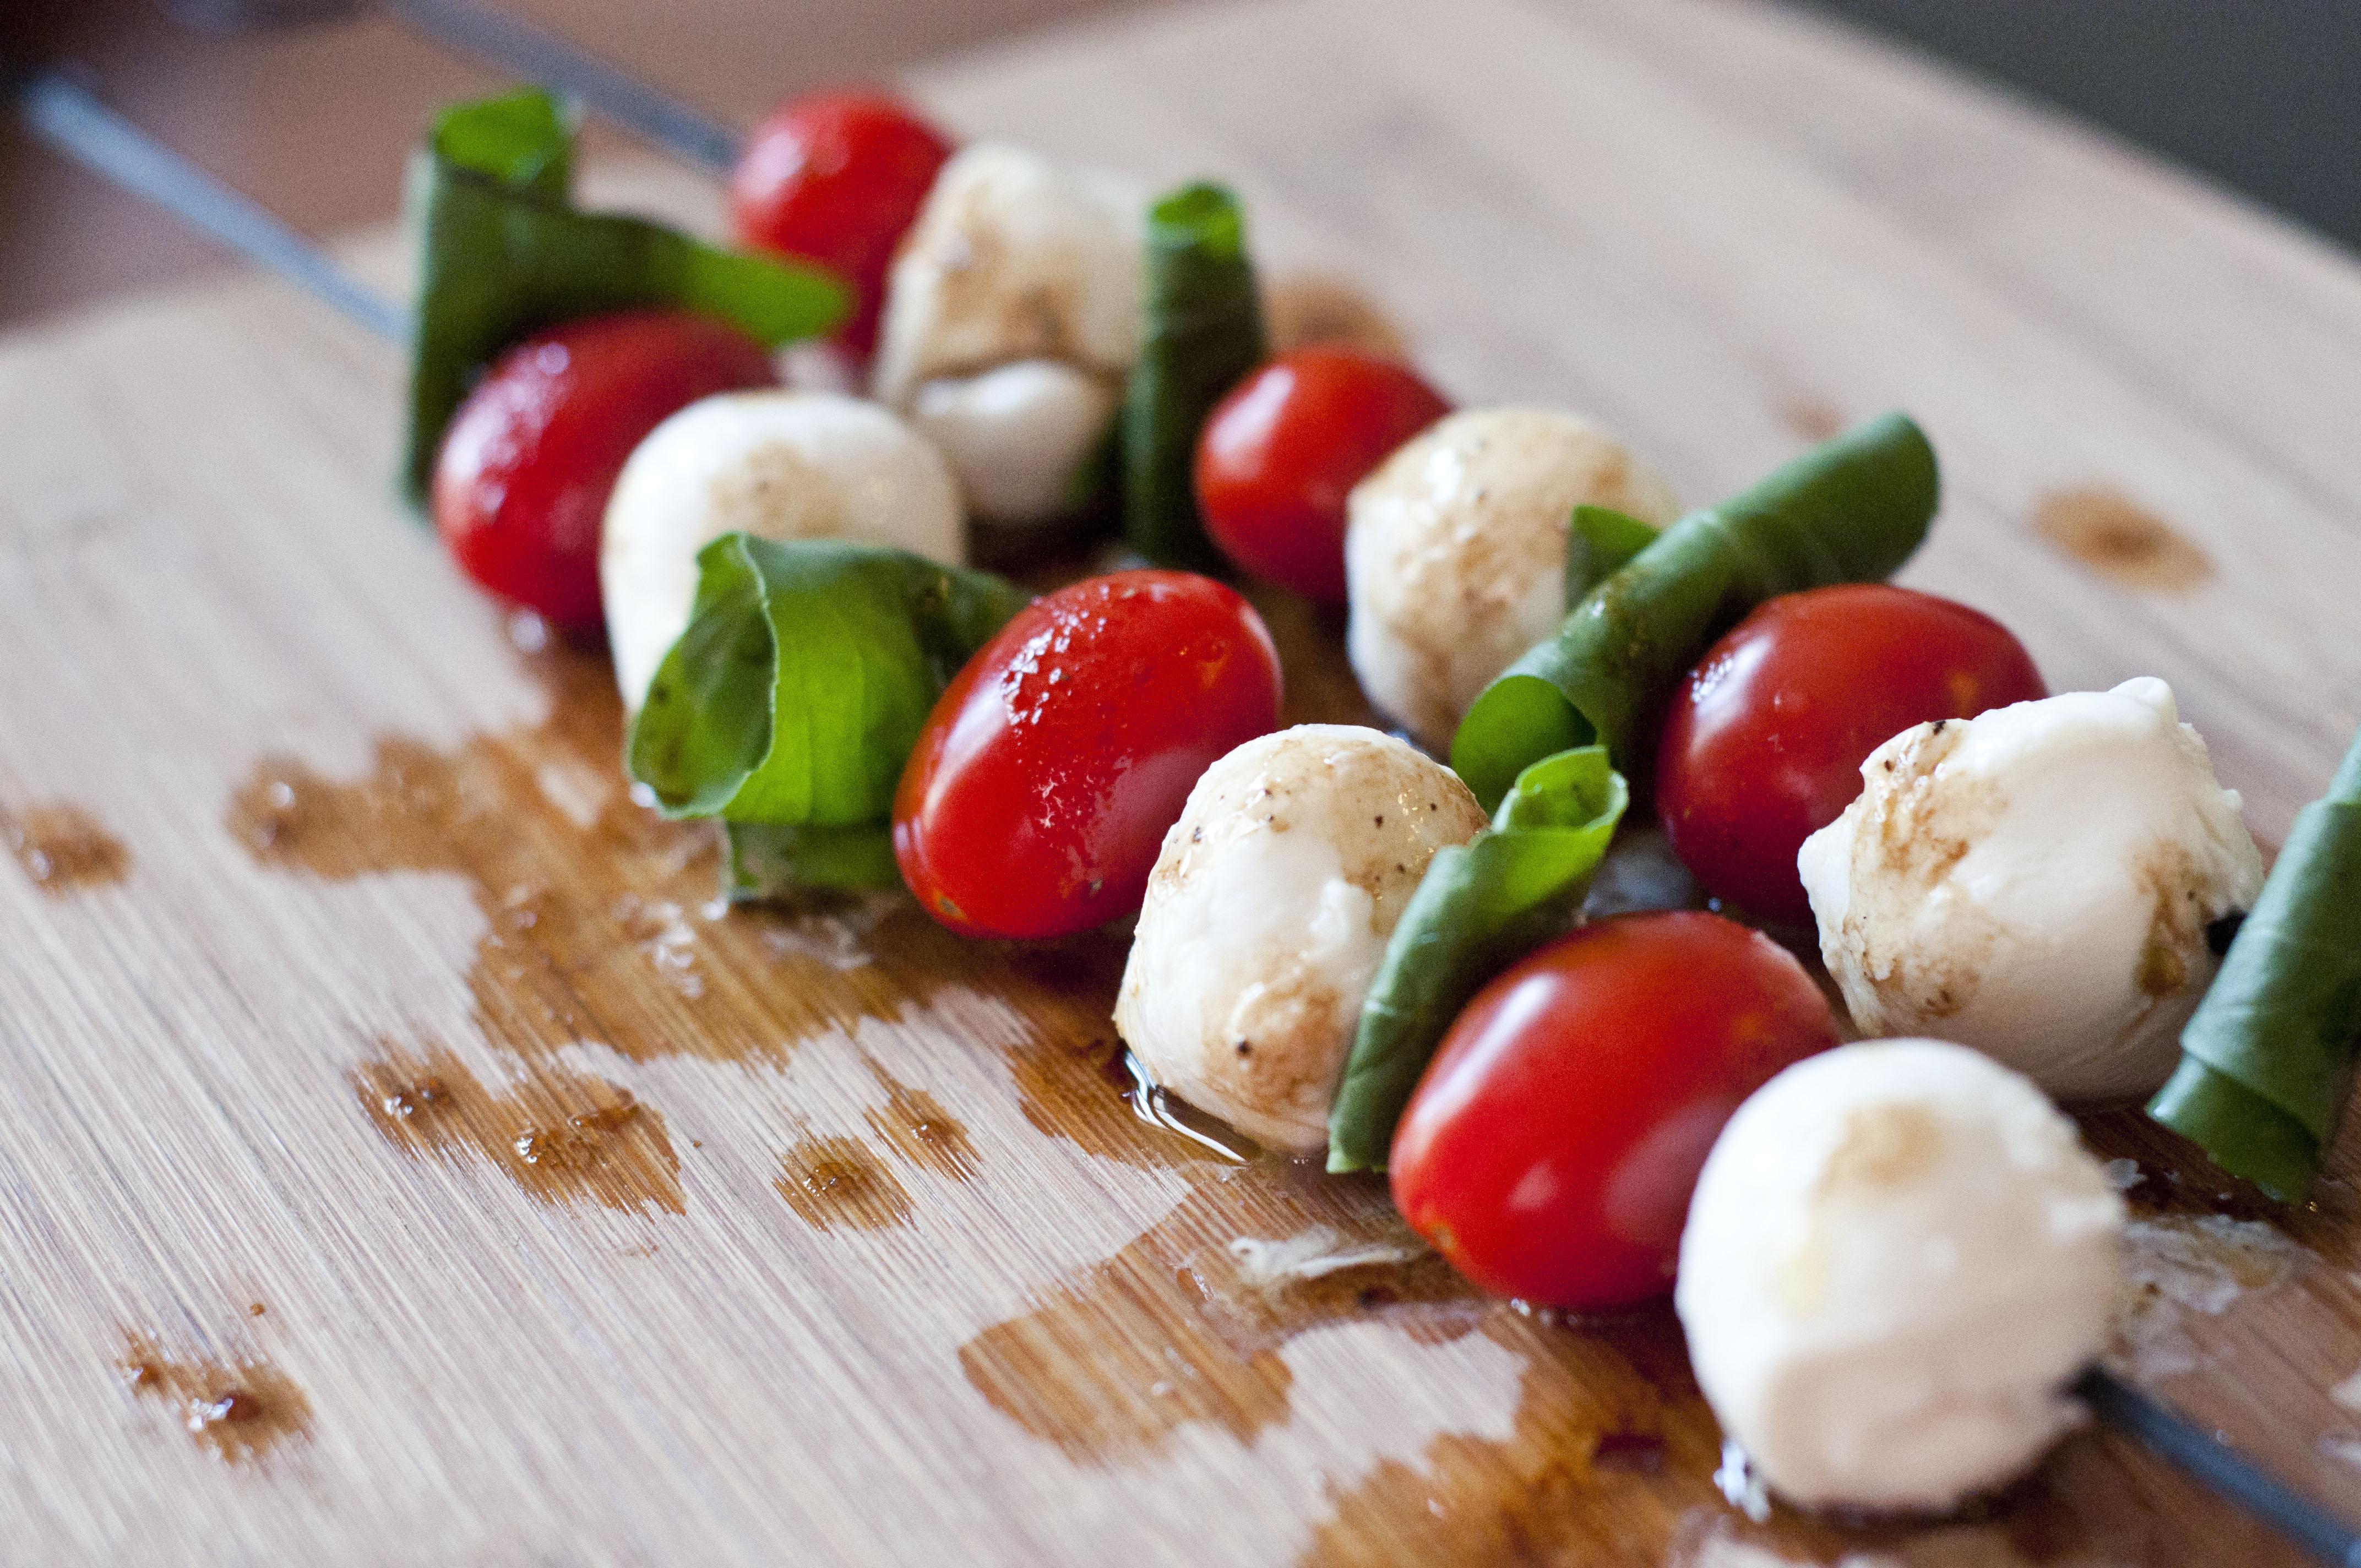 , mozzarella recipe, caprese salad skewer recipe, caprese skewers ...